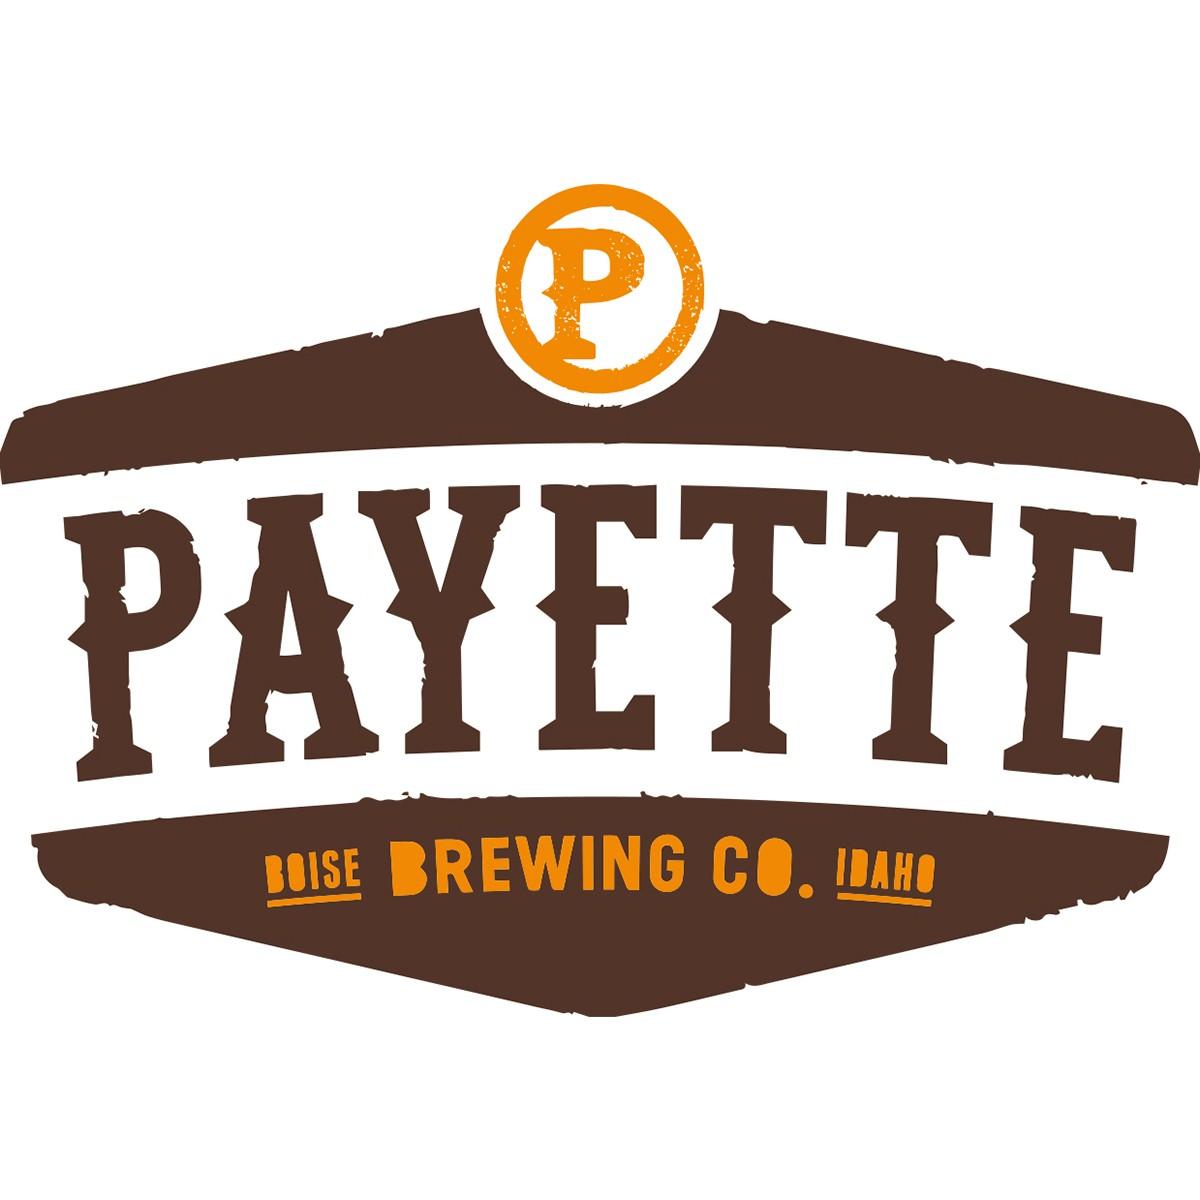 payette_brewing.jpg